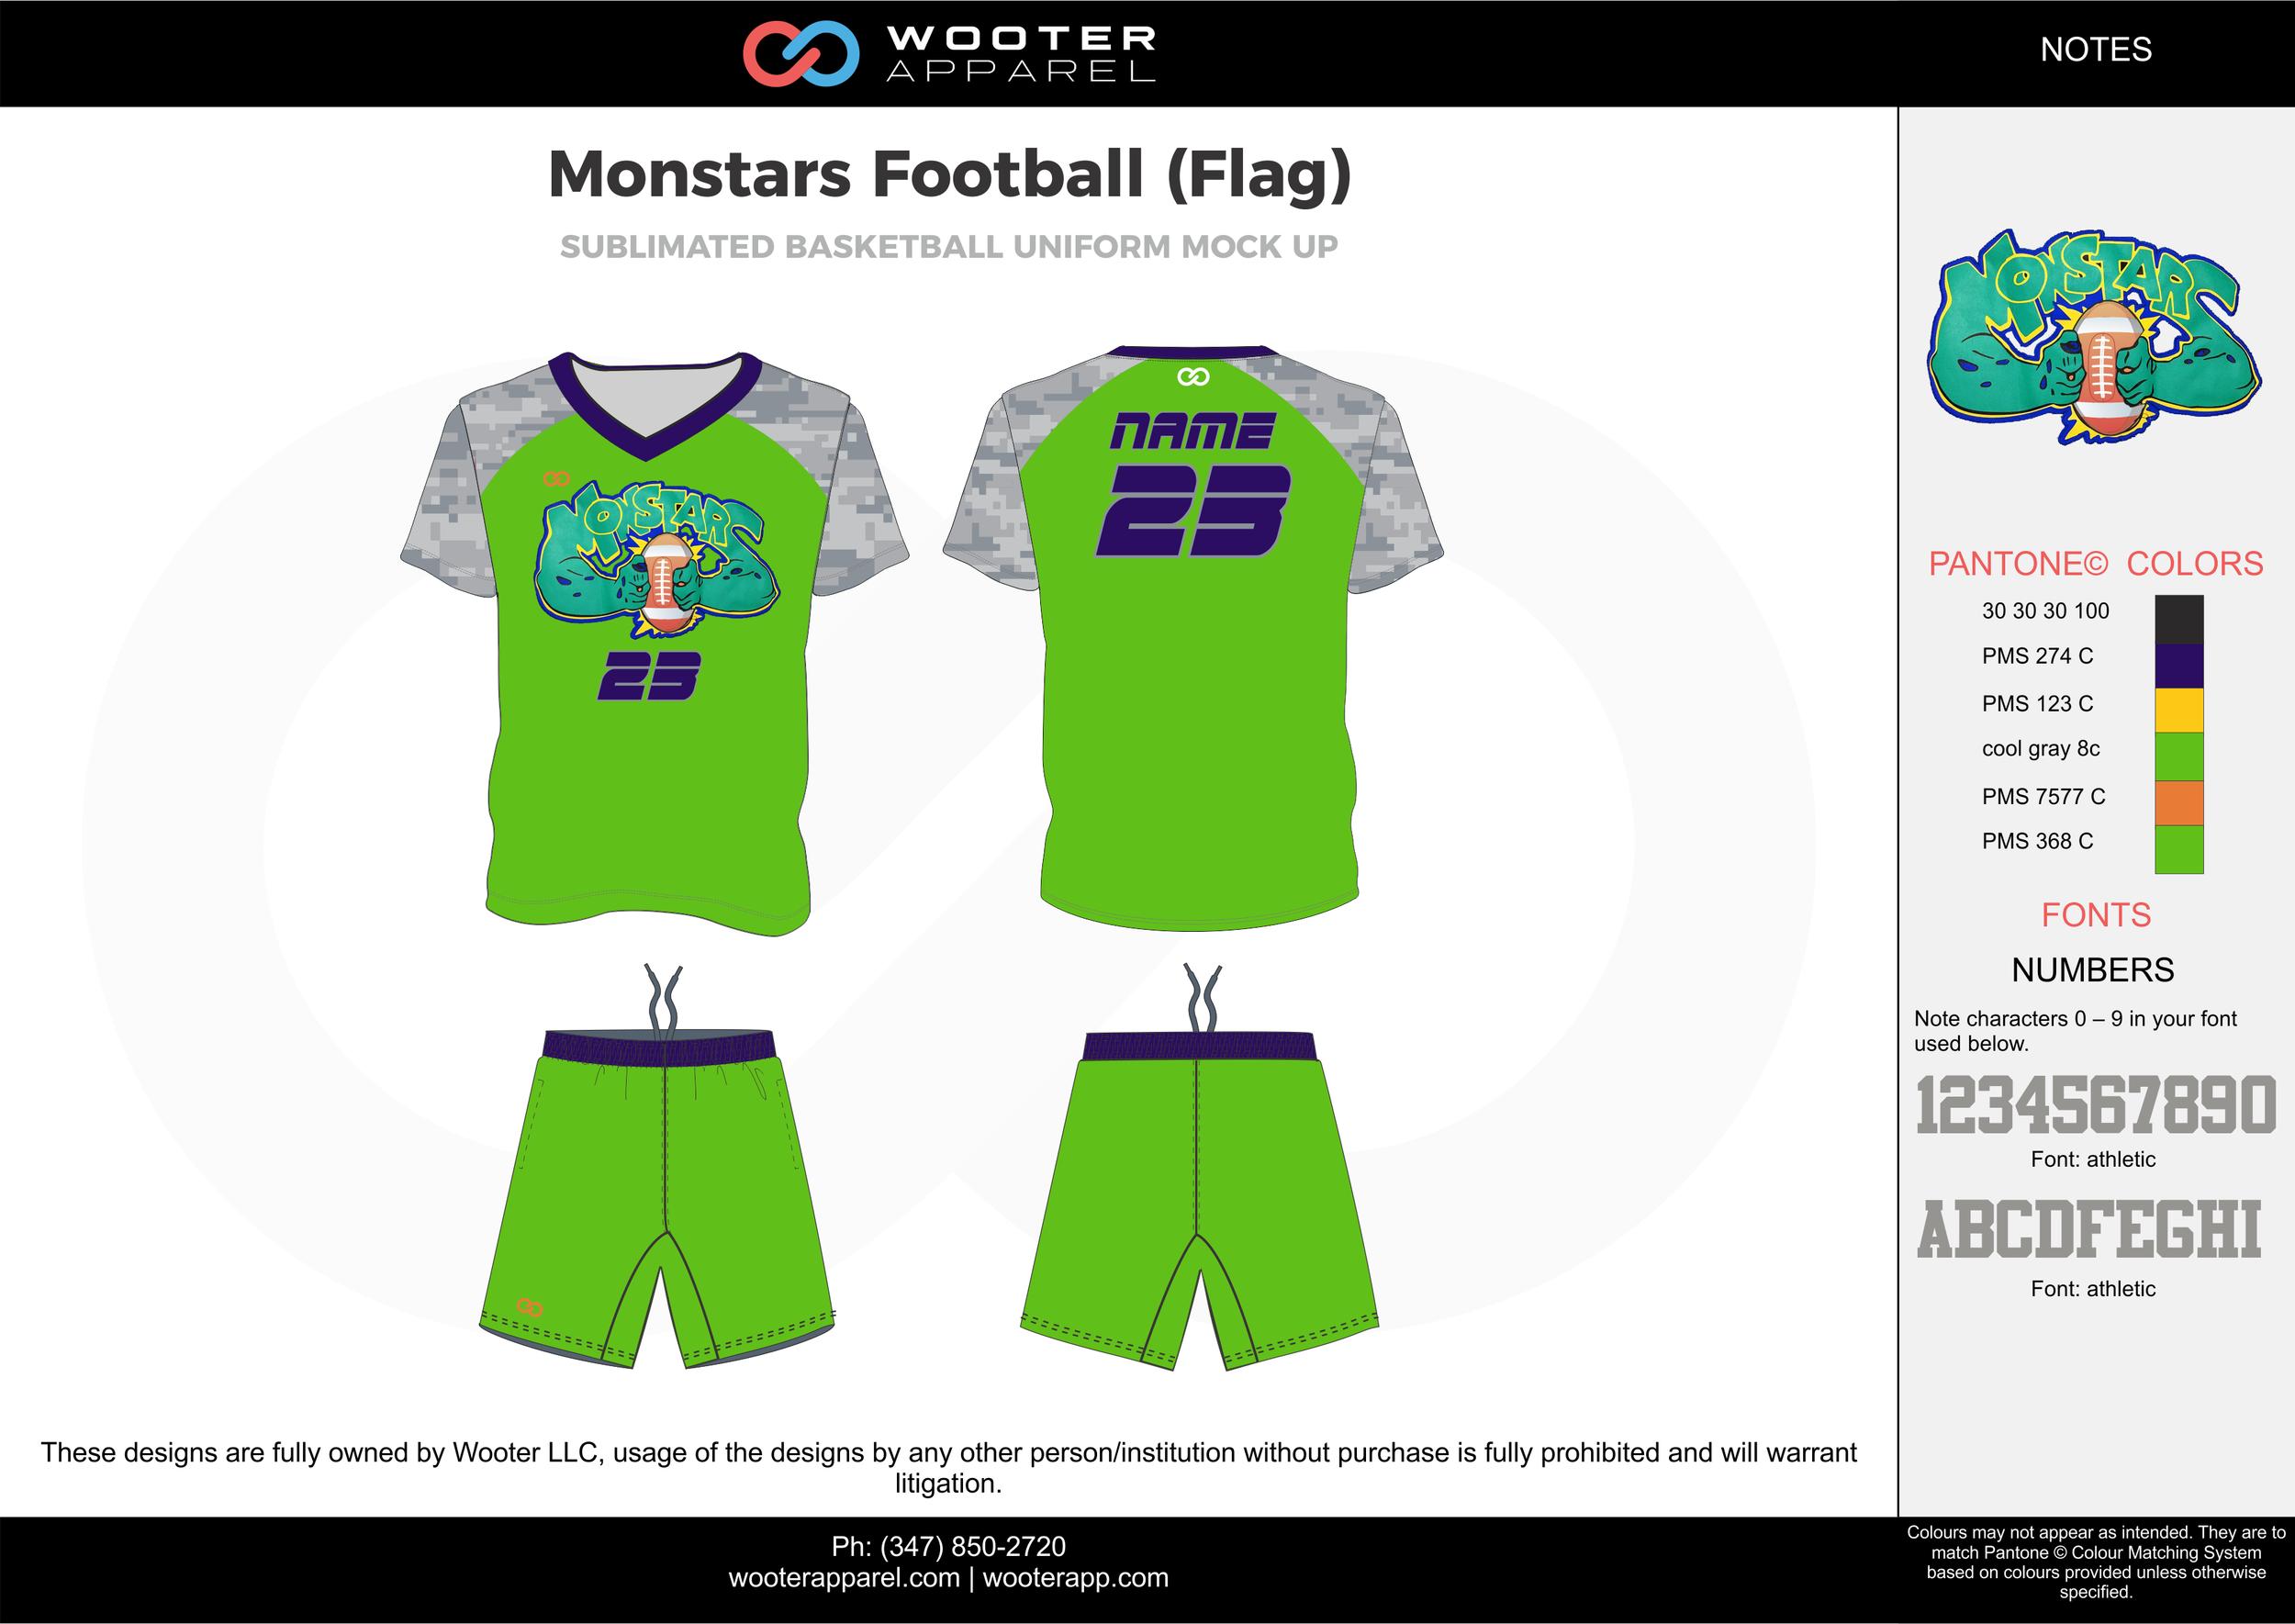 MONSTARS FOOTBALL (FLAG) green gray blue yellow flag football uniforms jerseys shorts